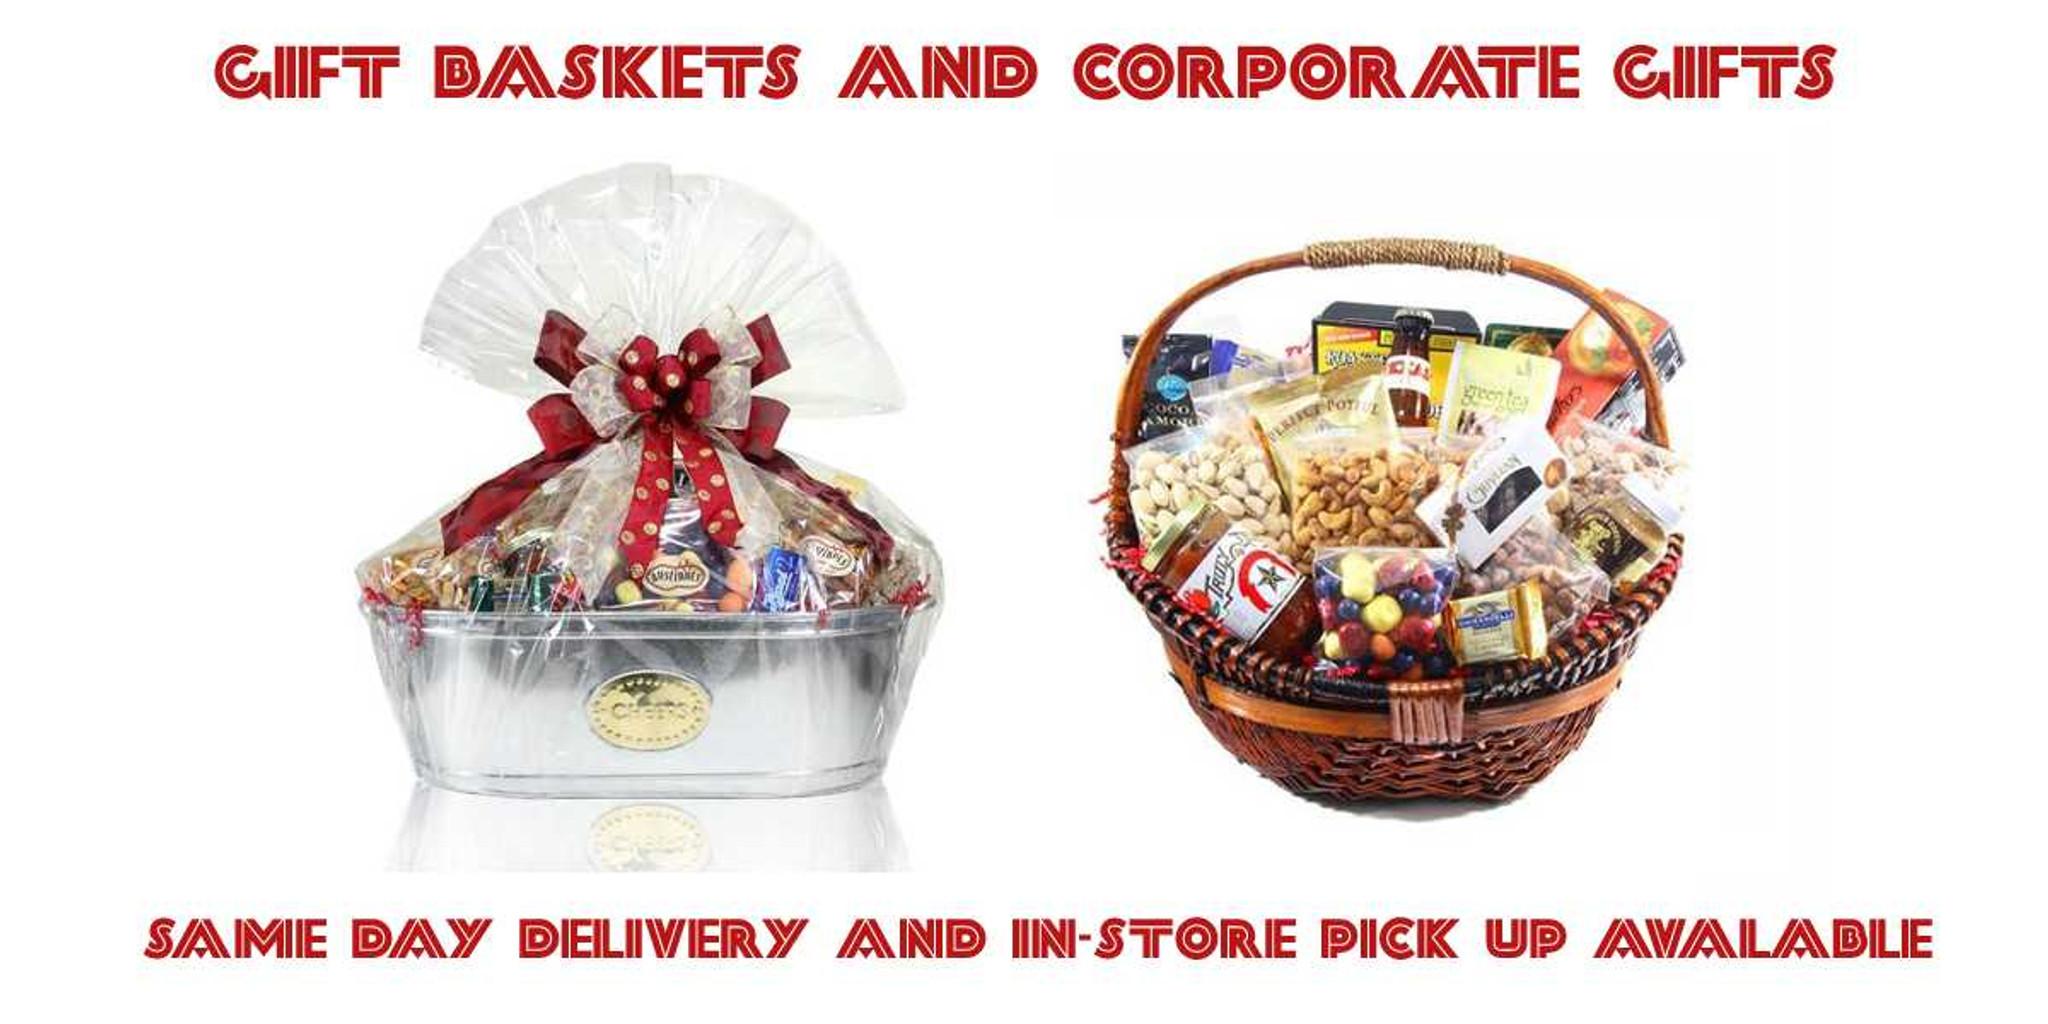 Why should I send a gift basket? austiNuts in Austin, TX